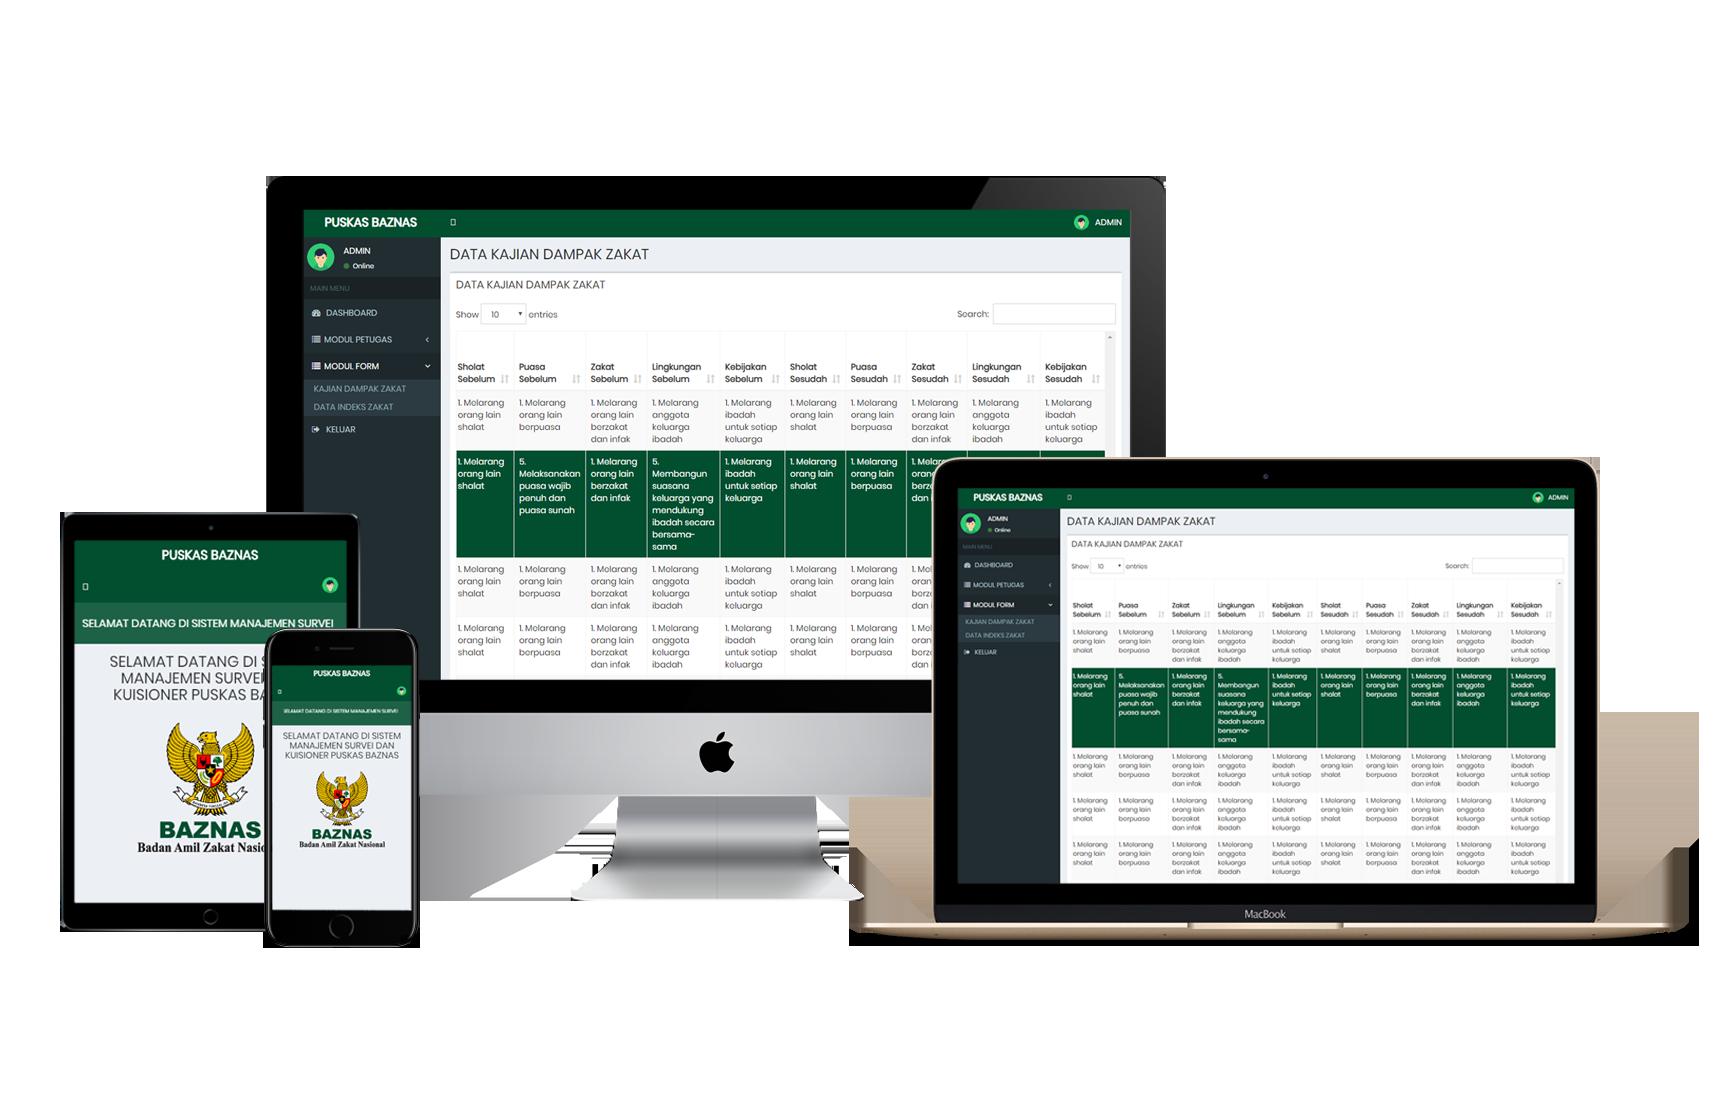 IZN (Indeks Zakat Nasional) Monitoring System